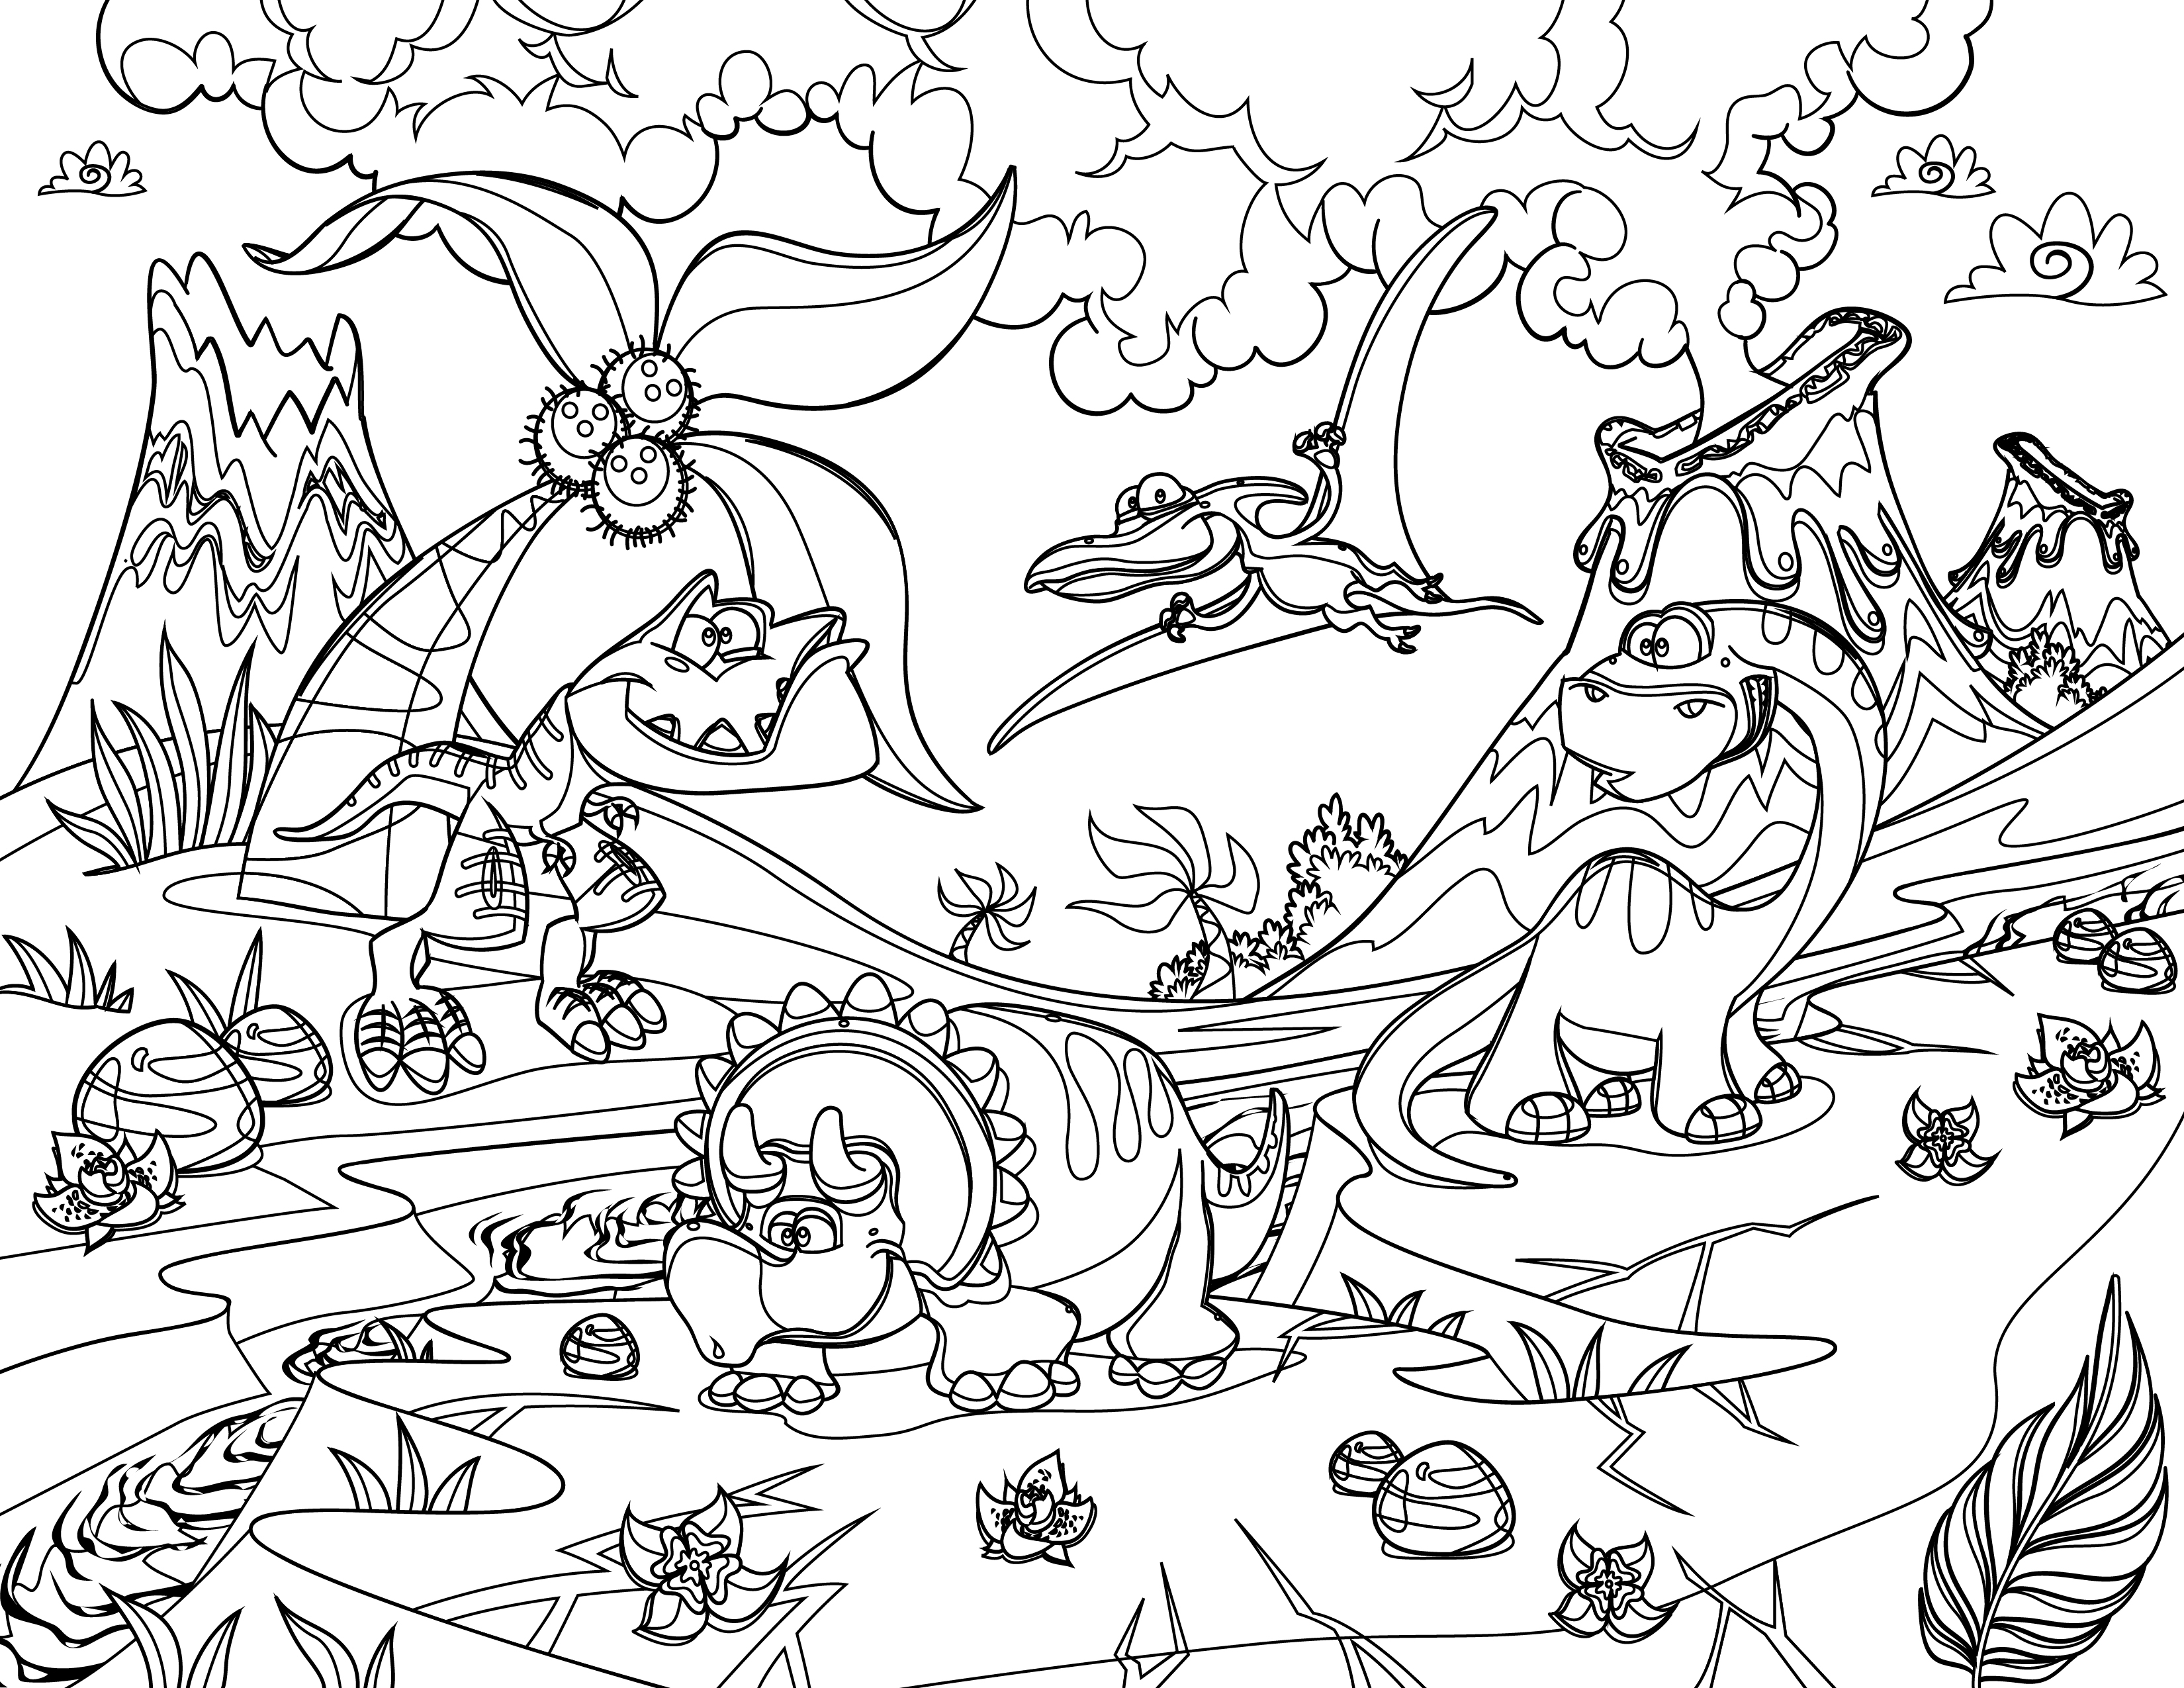 Coloriage Facile Dinosaure.Coloriage Dinosaure Art Therapie Bestiaire Tres Difficile